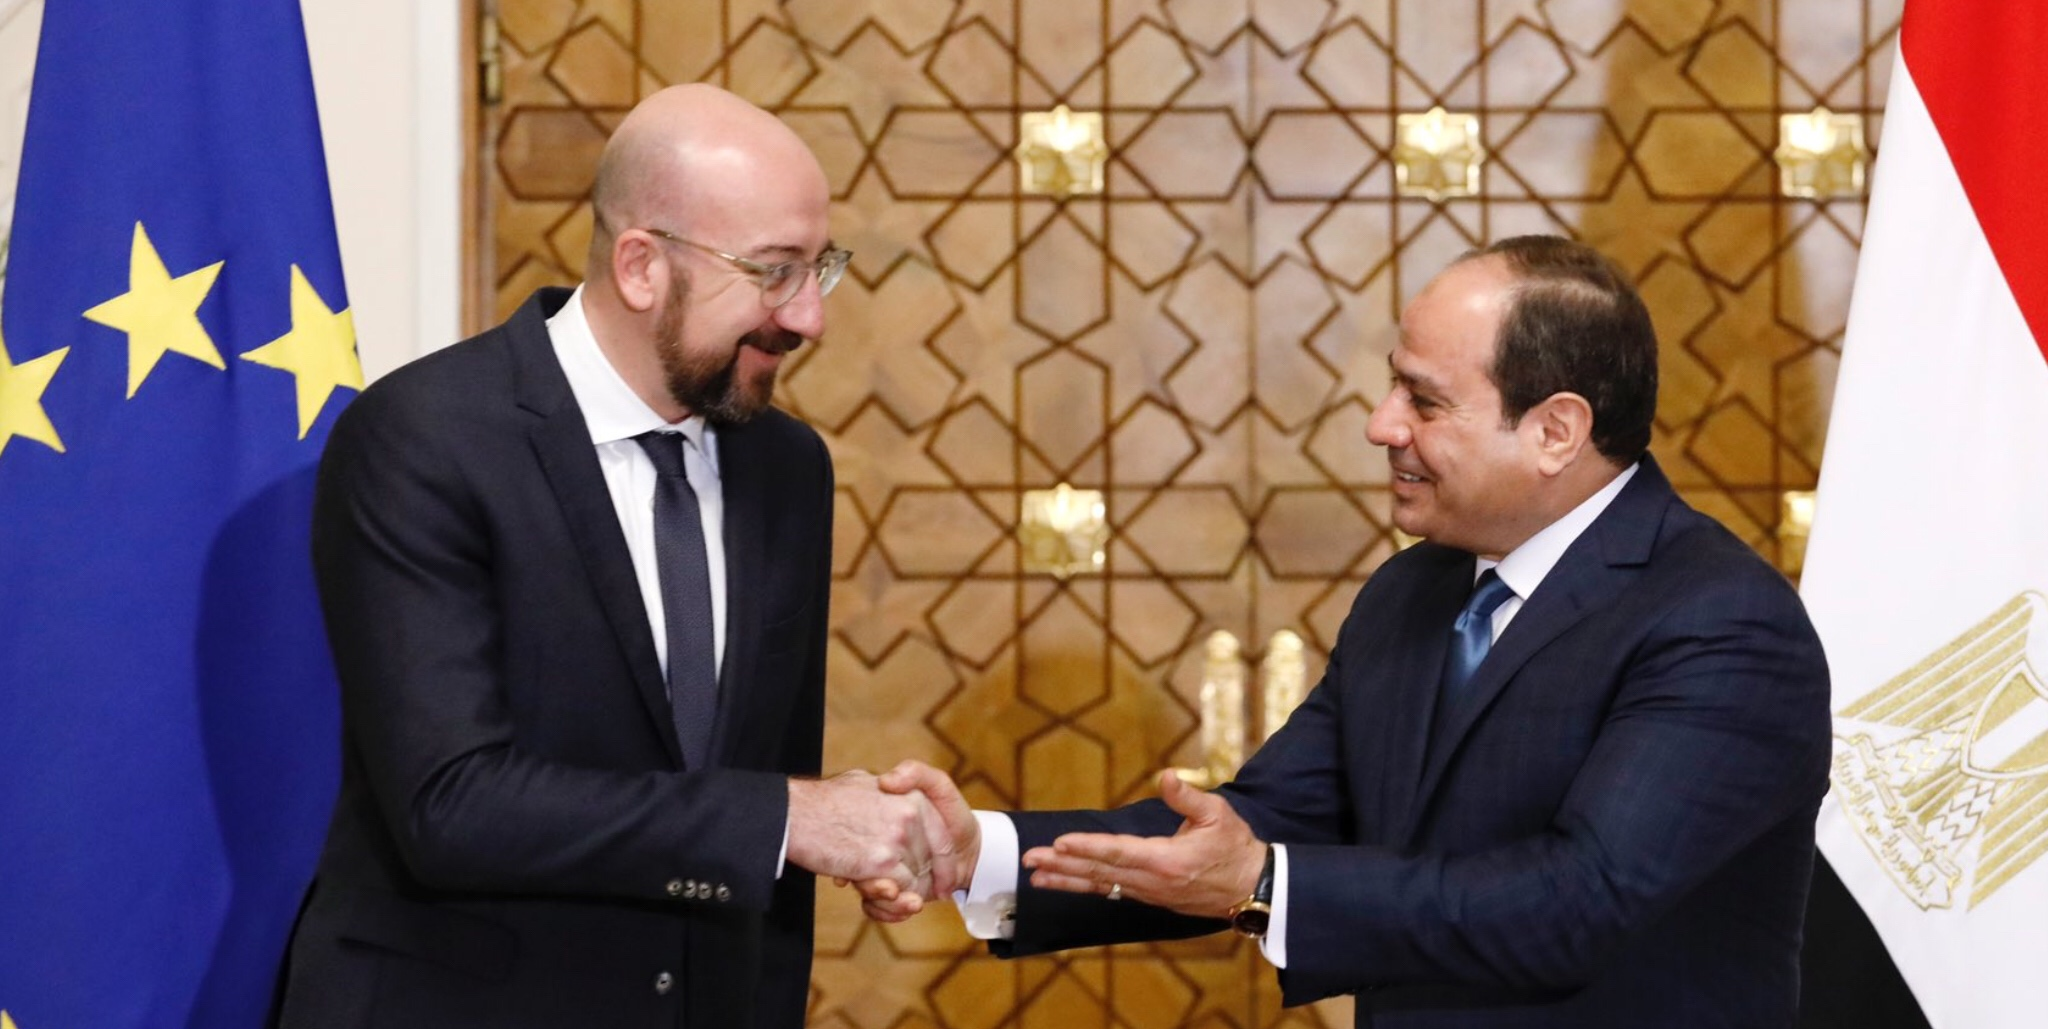 Michel discusses Libya with Al-Sisi